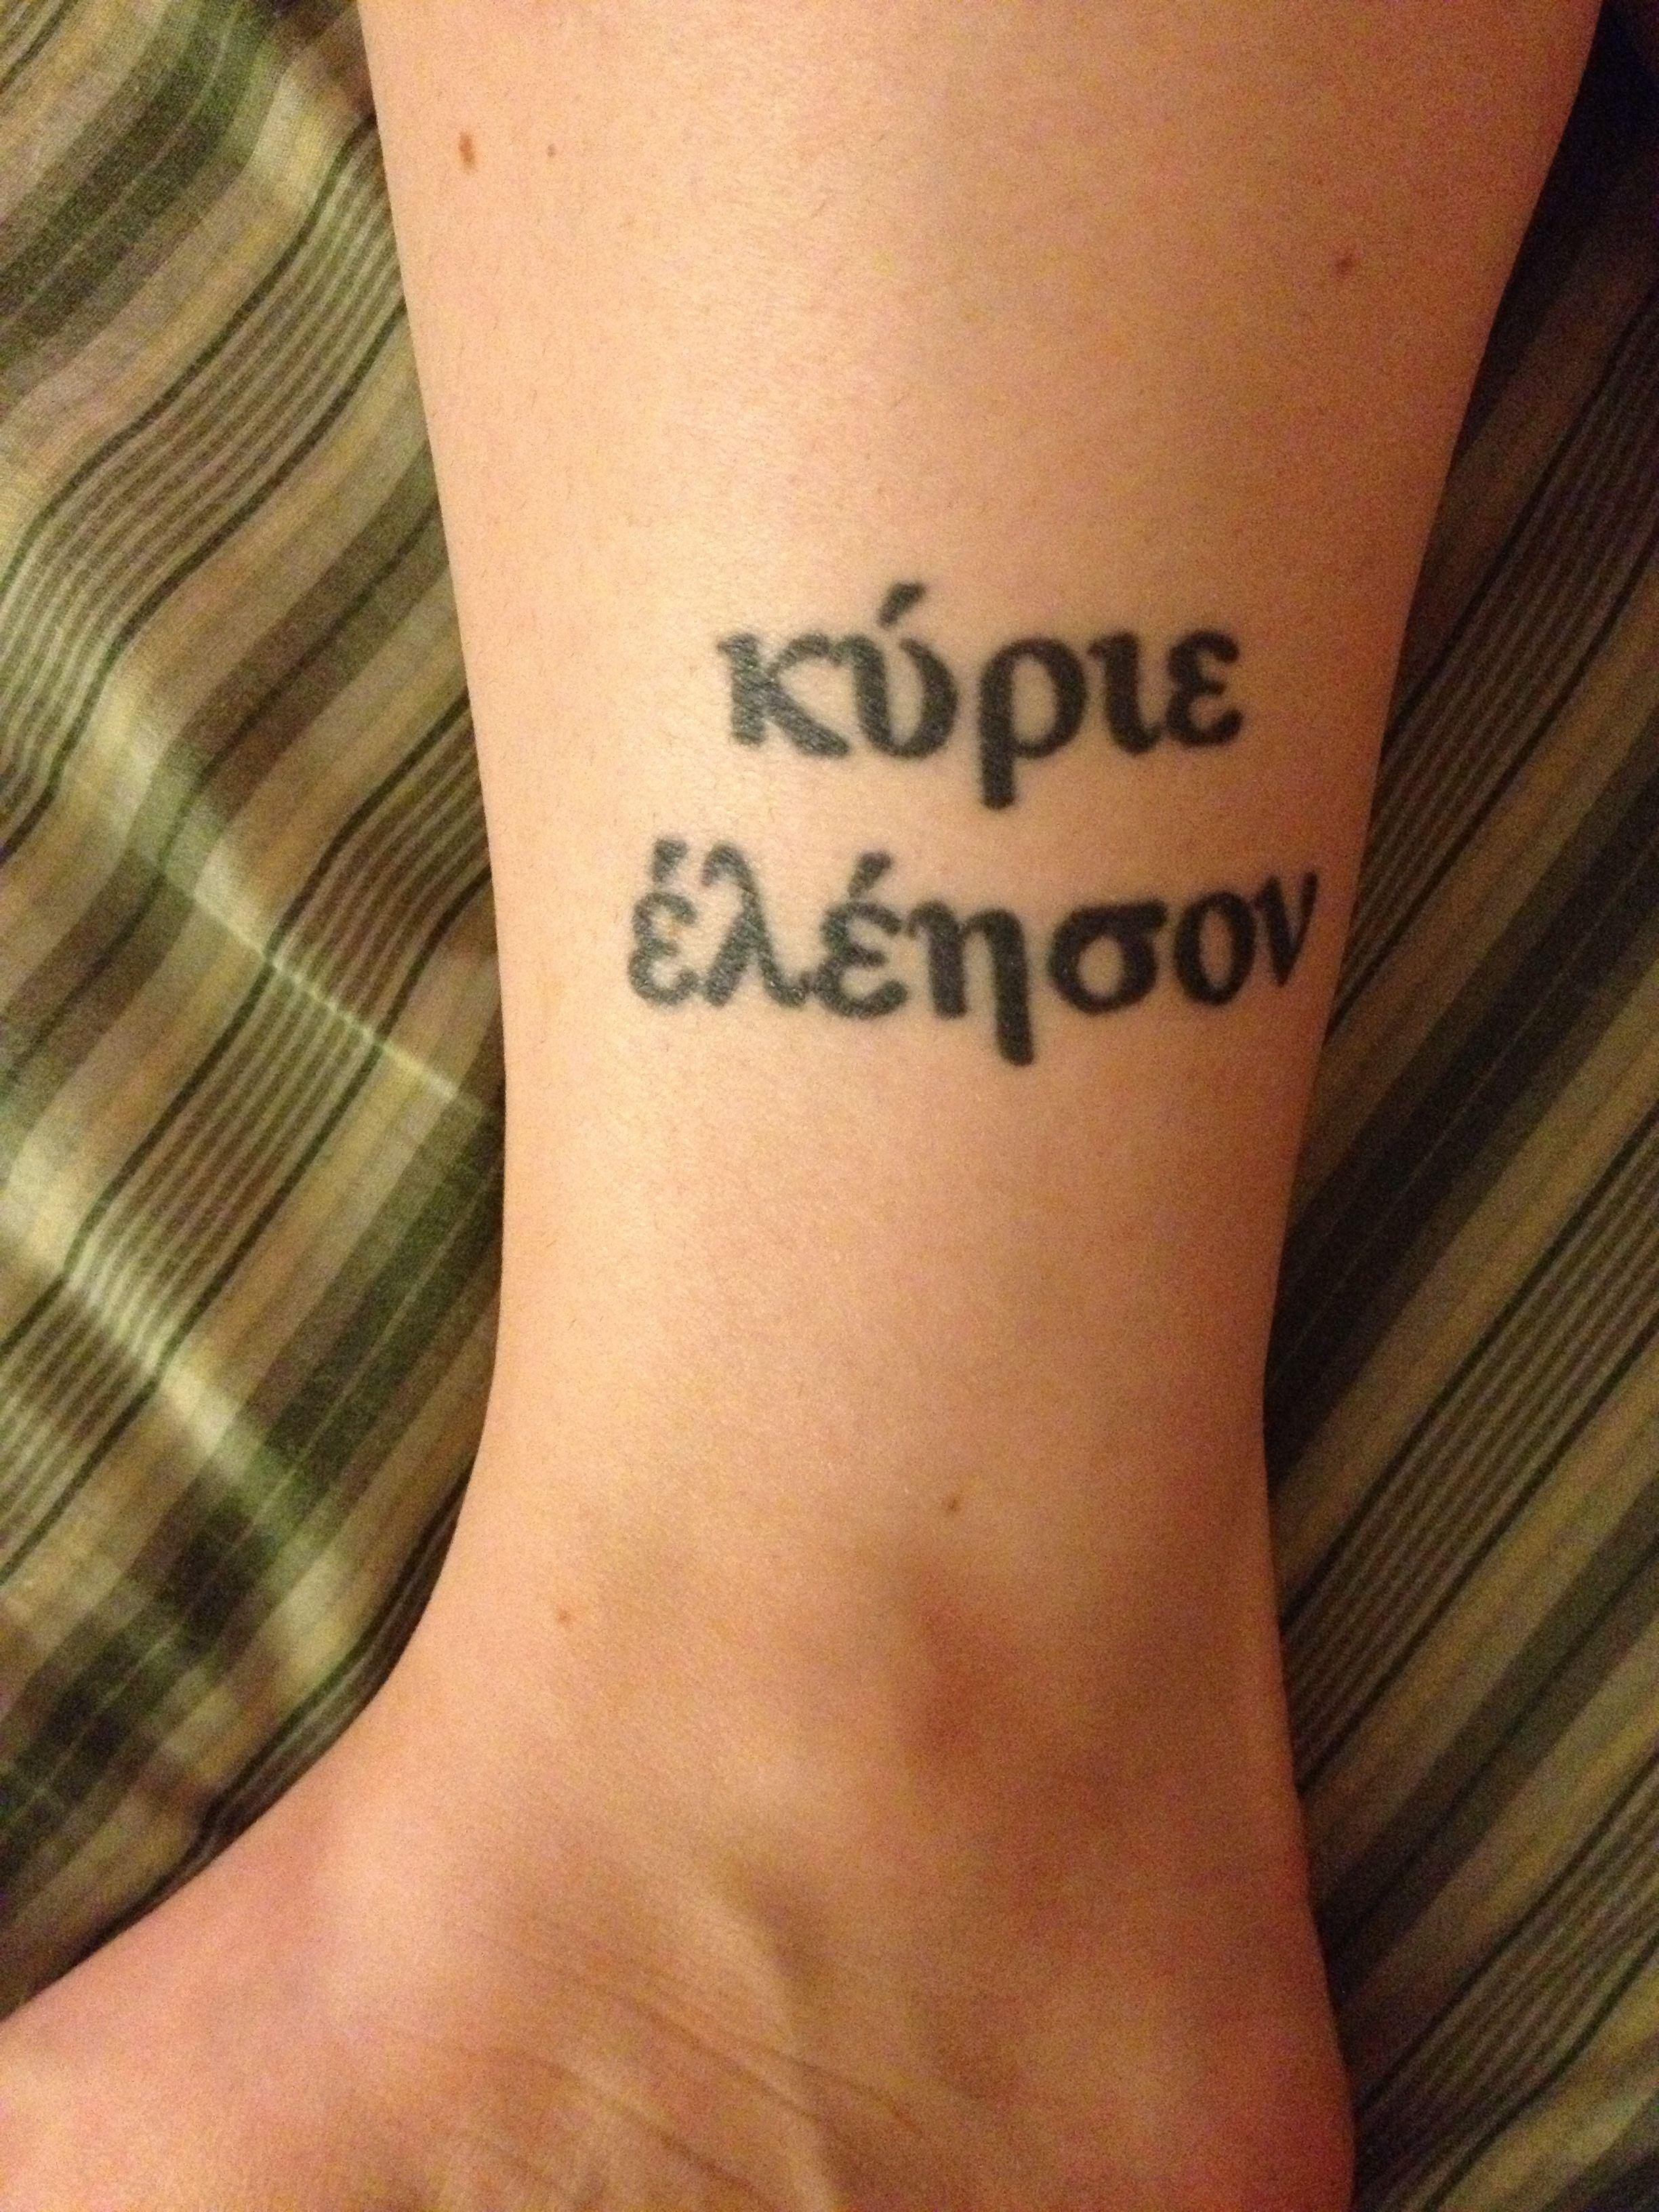 Kyrie eleison in its original Greek  It means